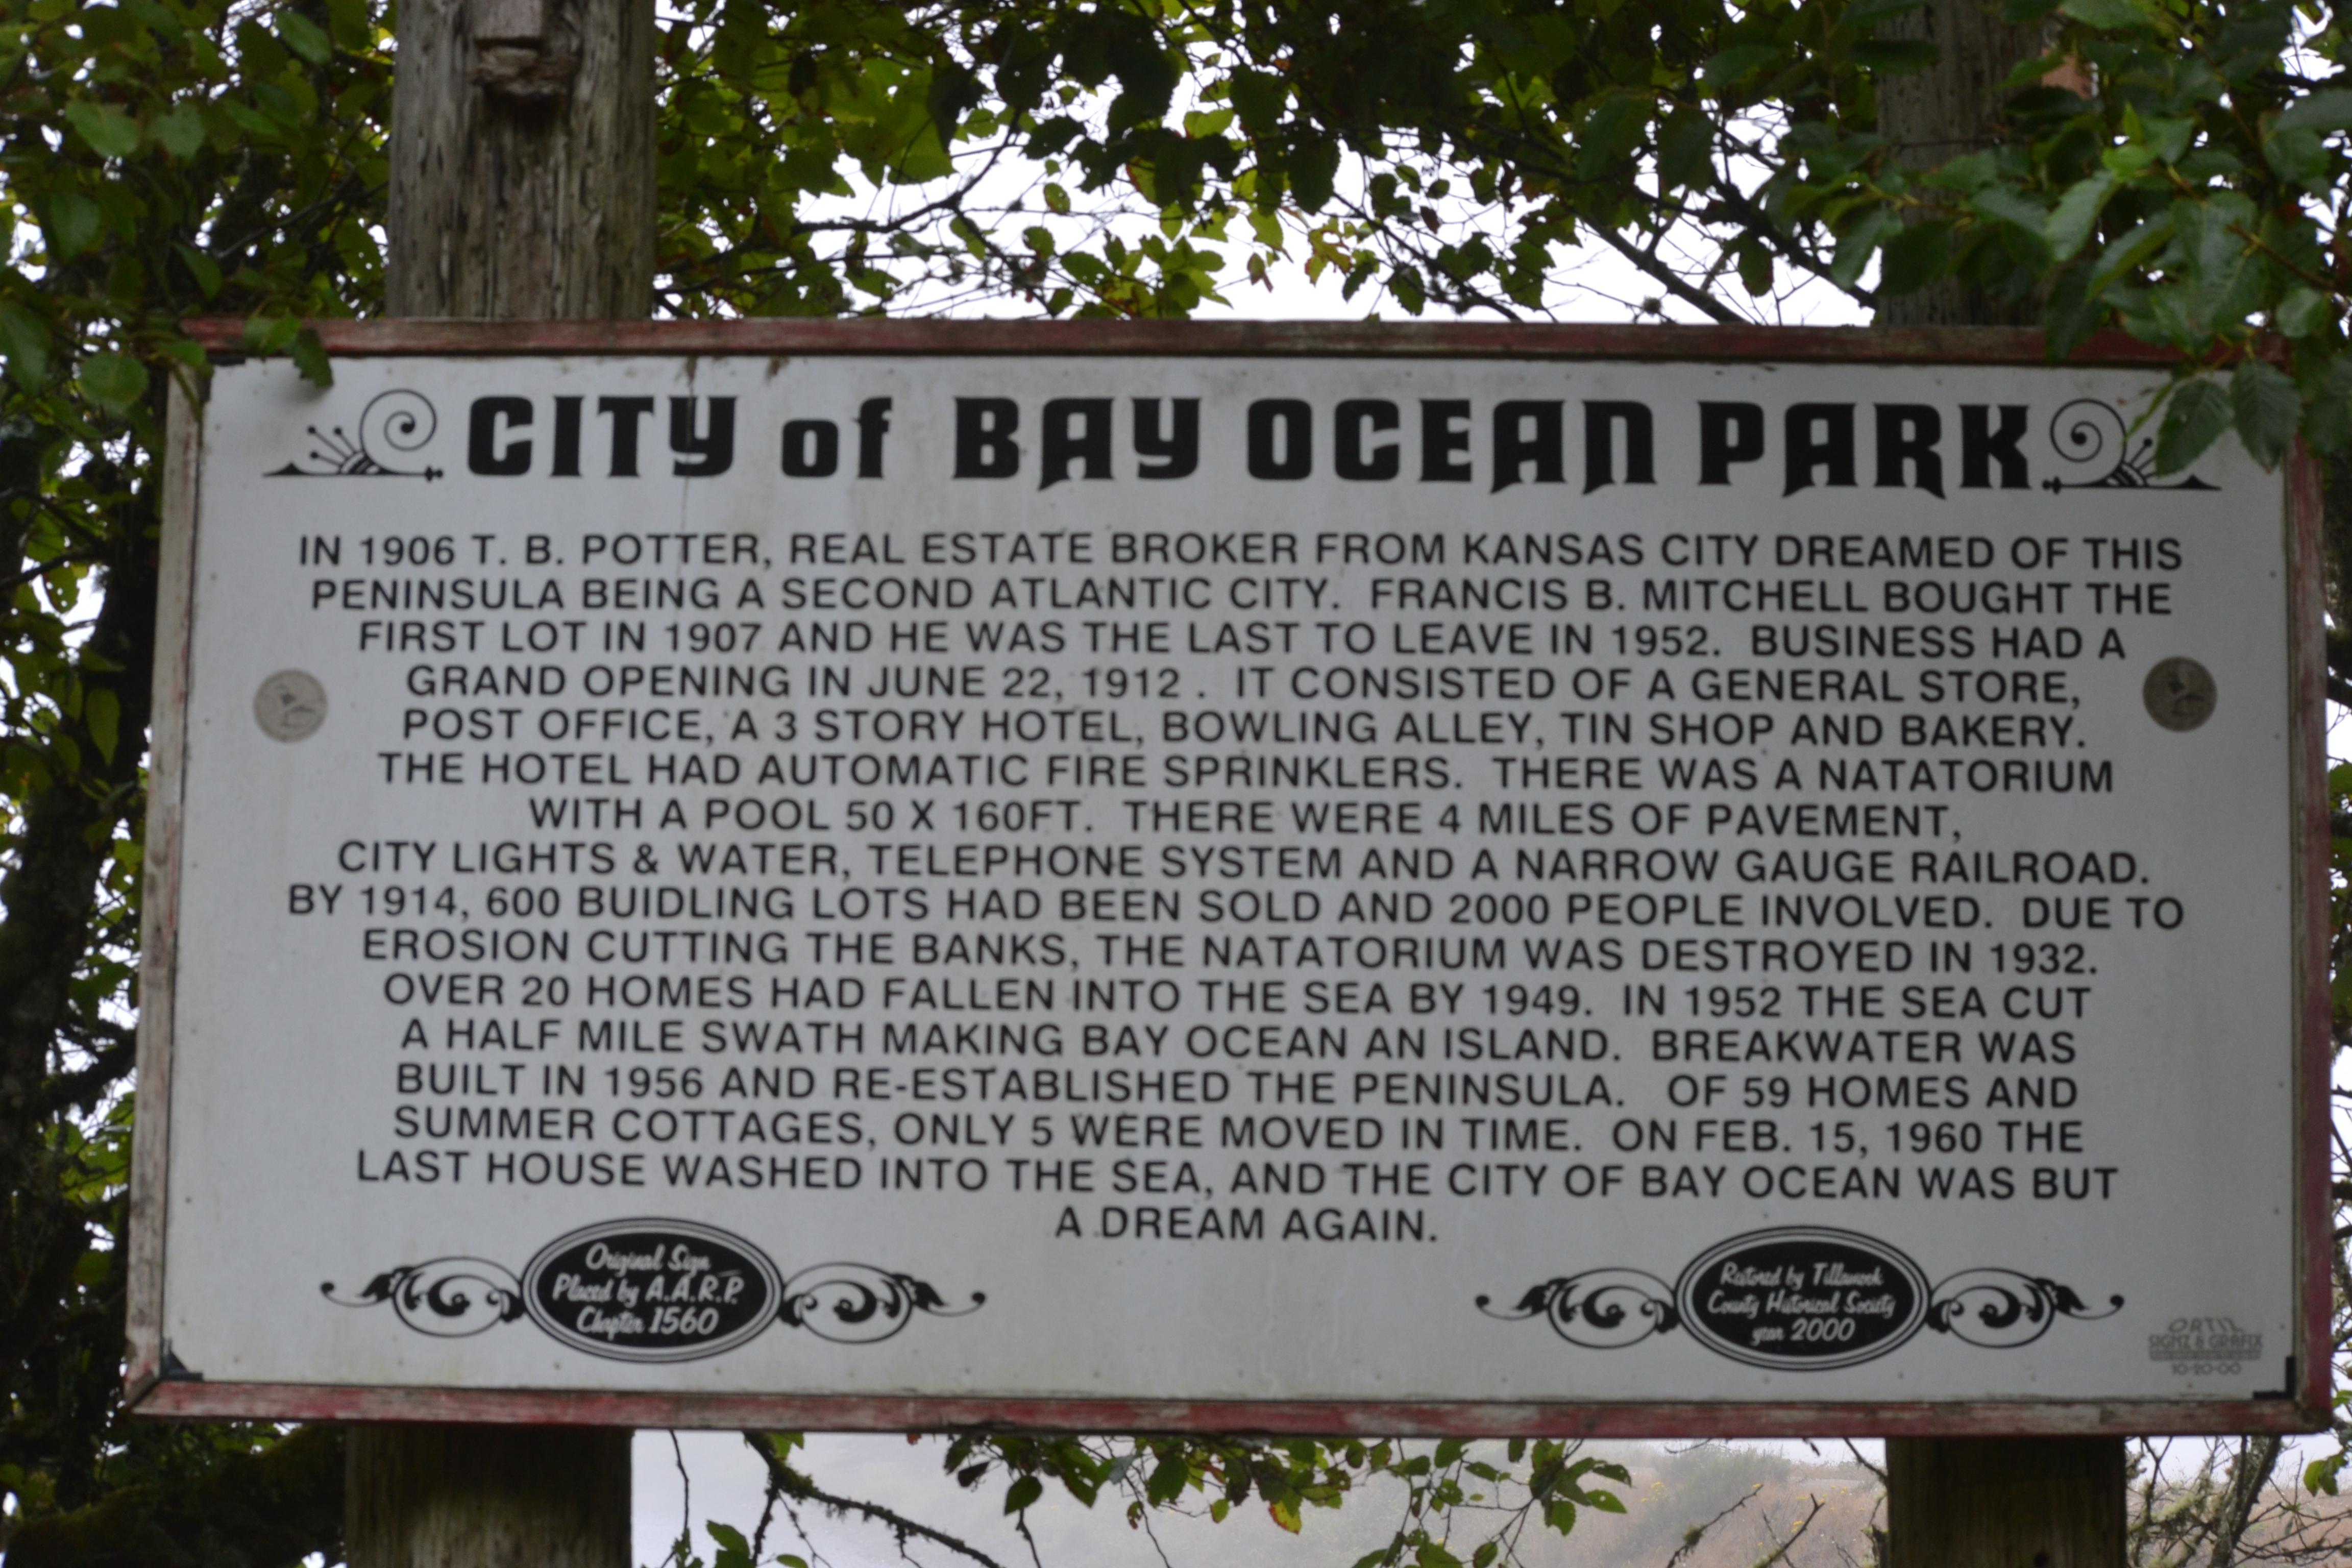 DSC_0002 (1)City of Bay Ocean Park sign